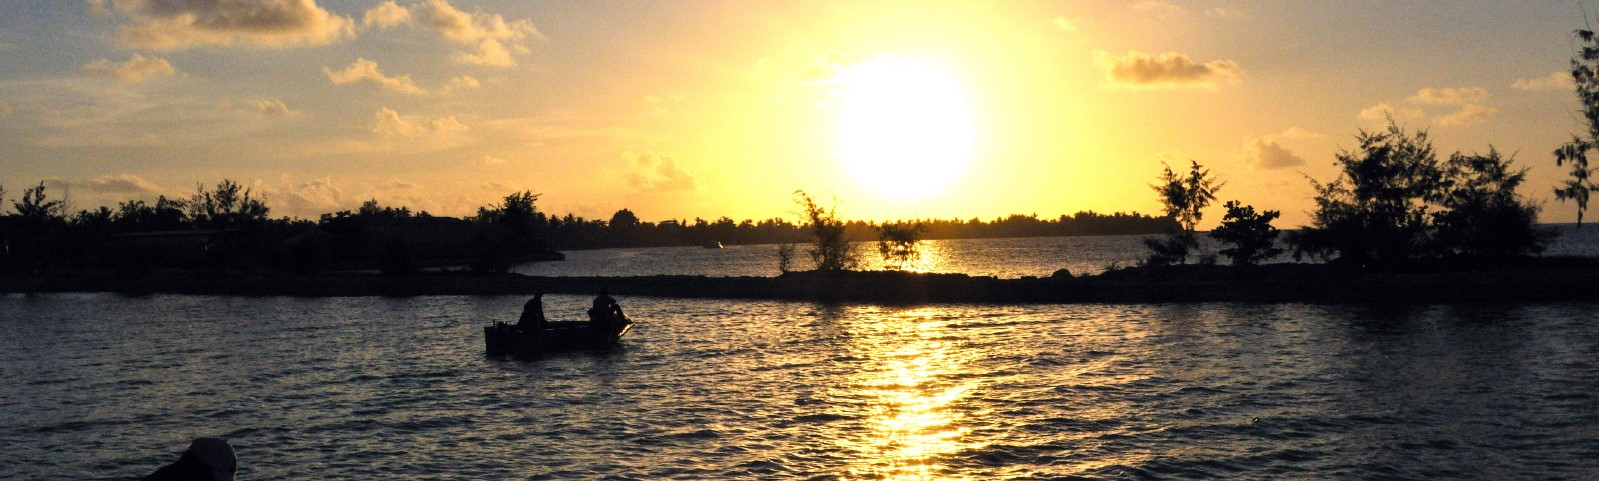 Betio harbour, 2008 (Photo: jopolopy/Flickr)